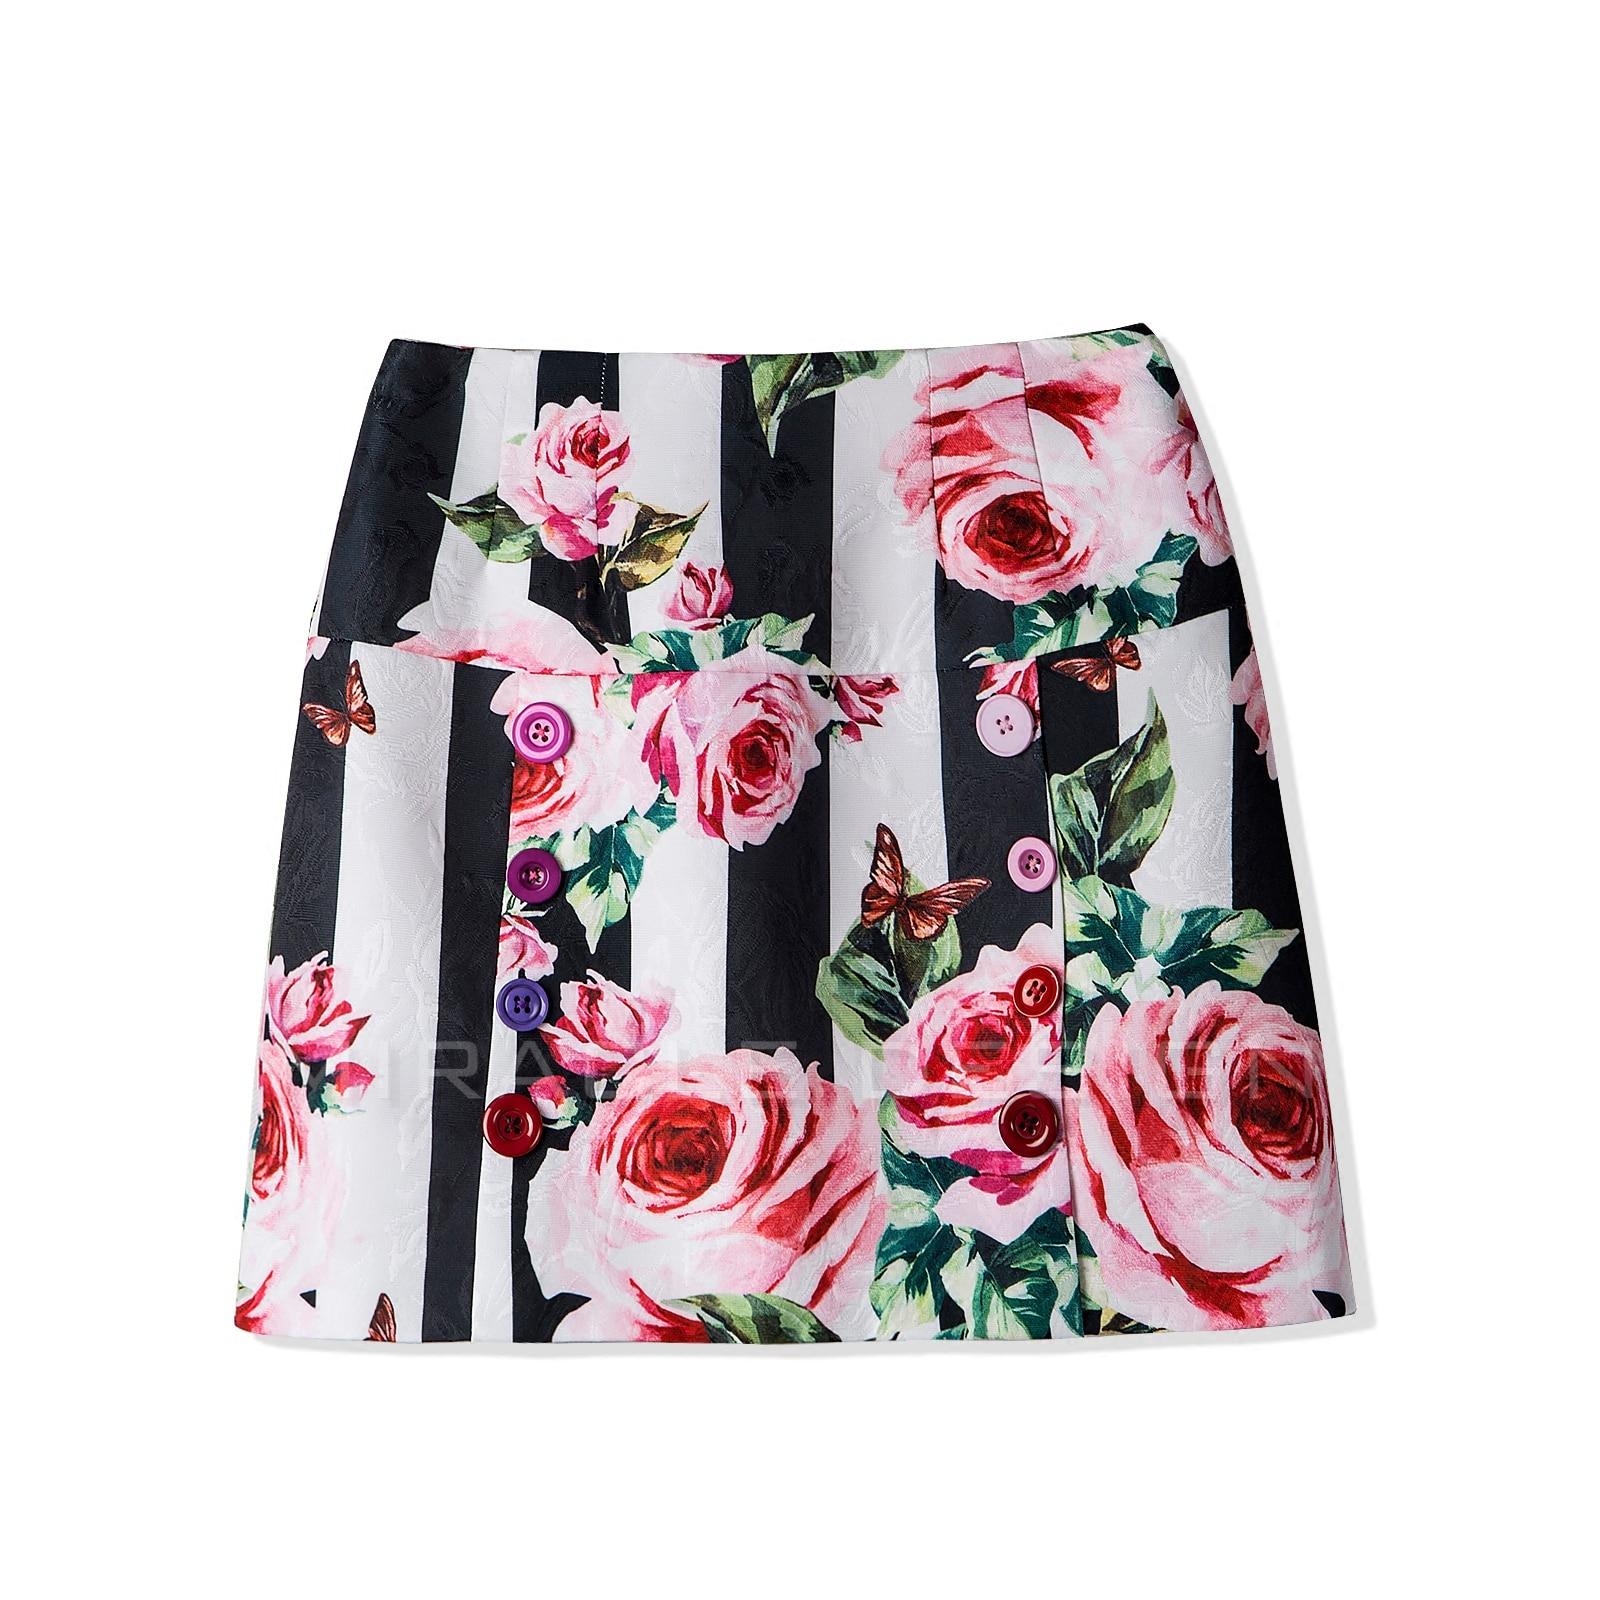 New European romantic roses printed 2018 Dark jacquard Custom color double breasted Tall waist A pendulum skirts